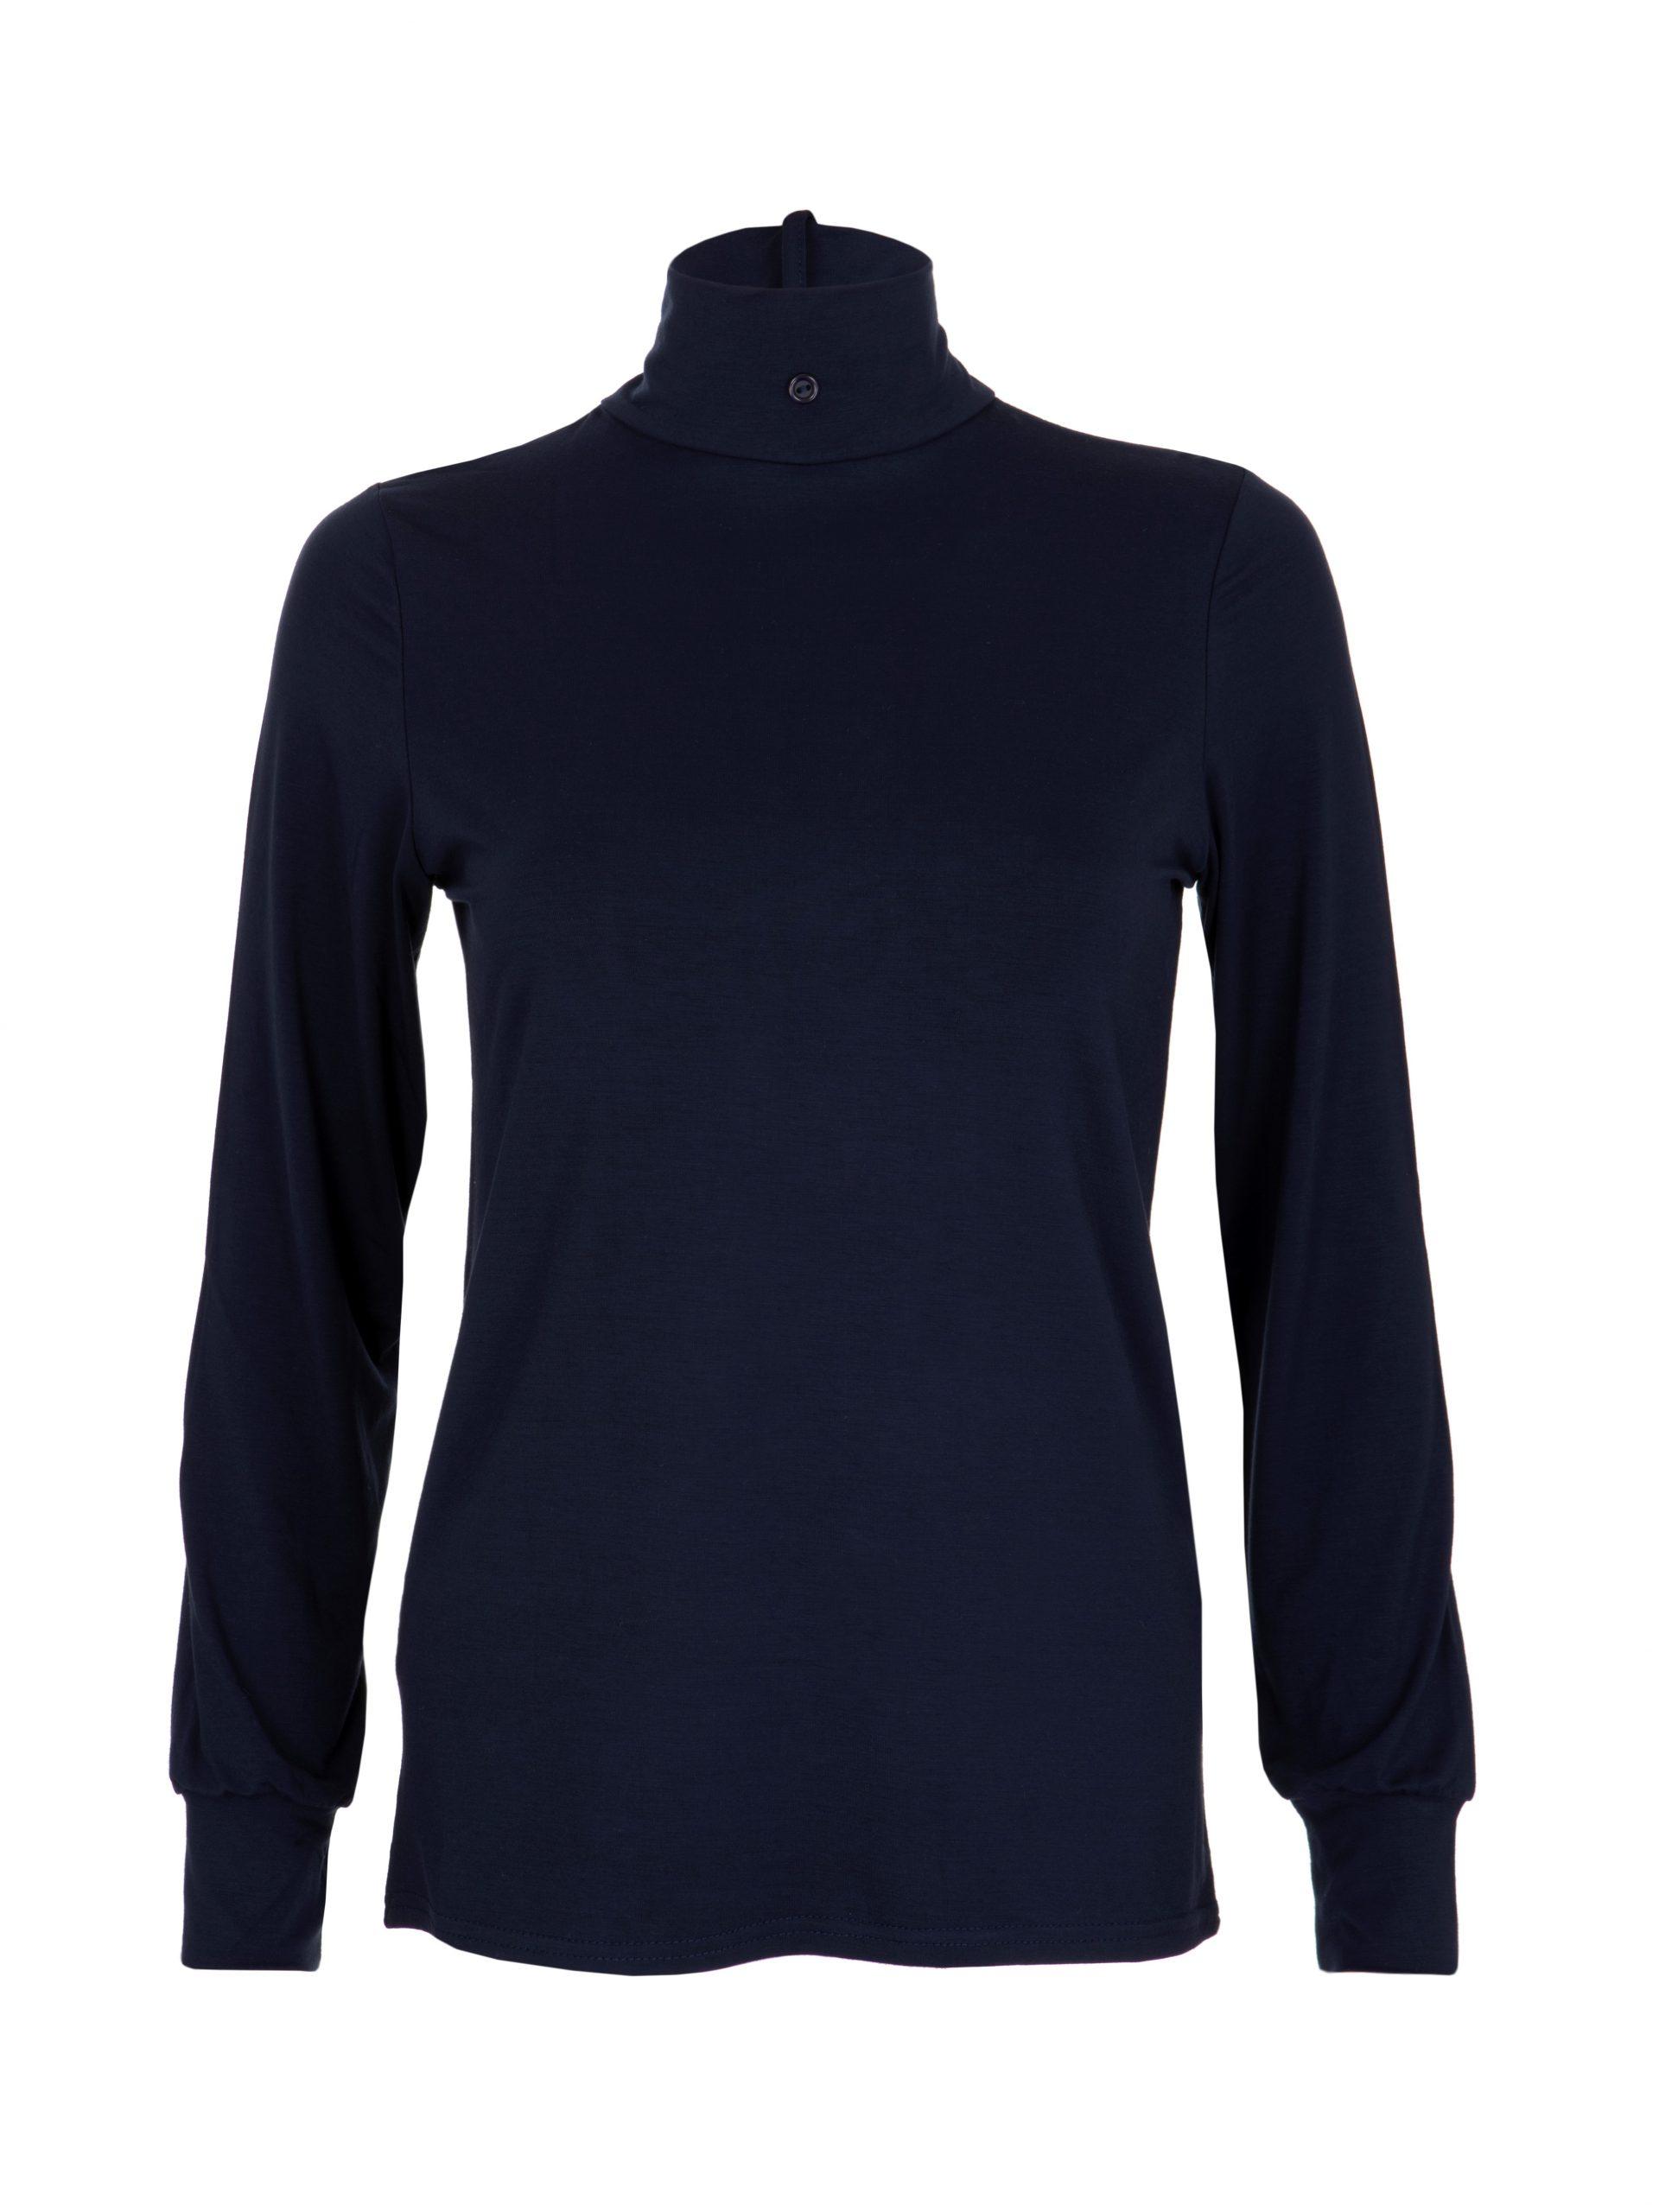 ladies navy stock shirt